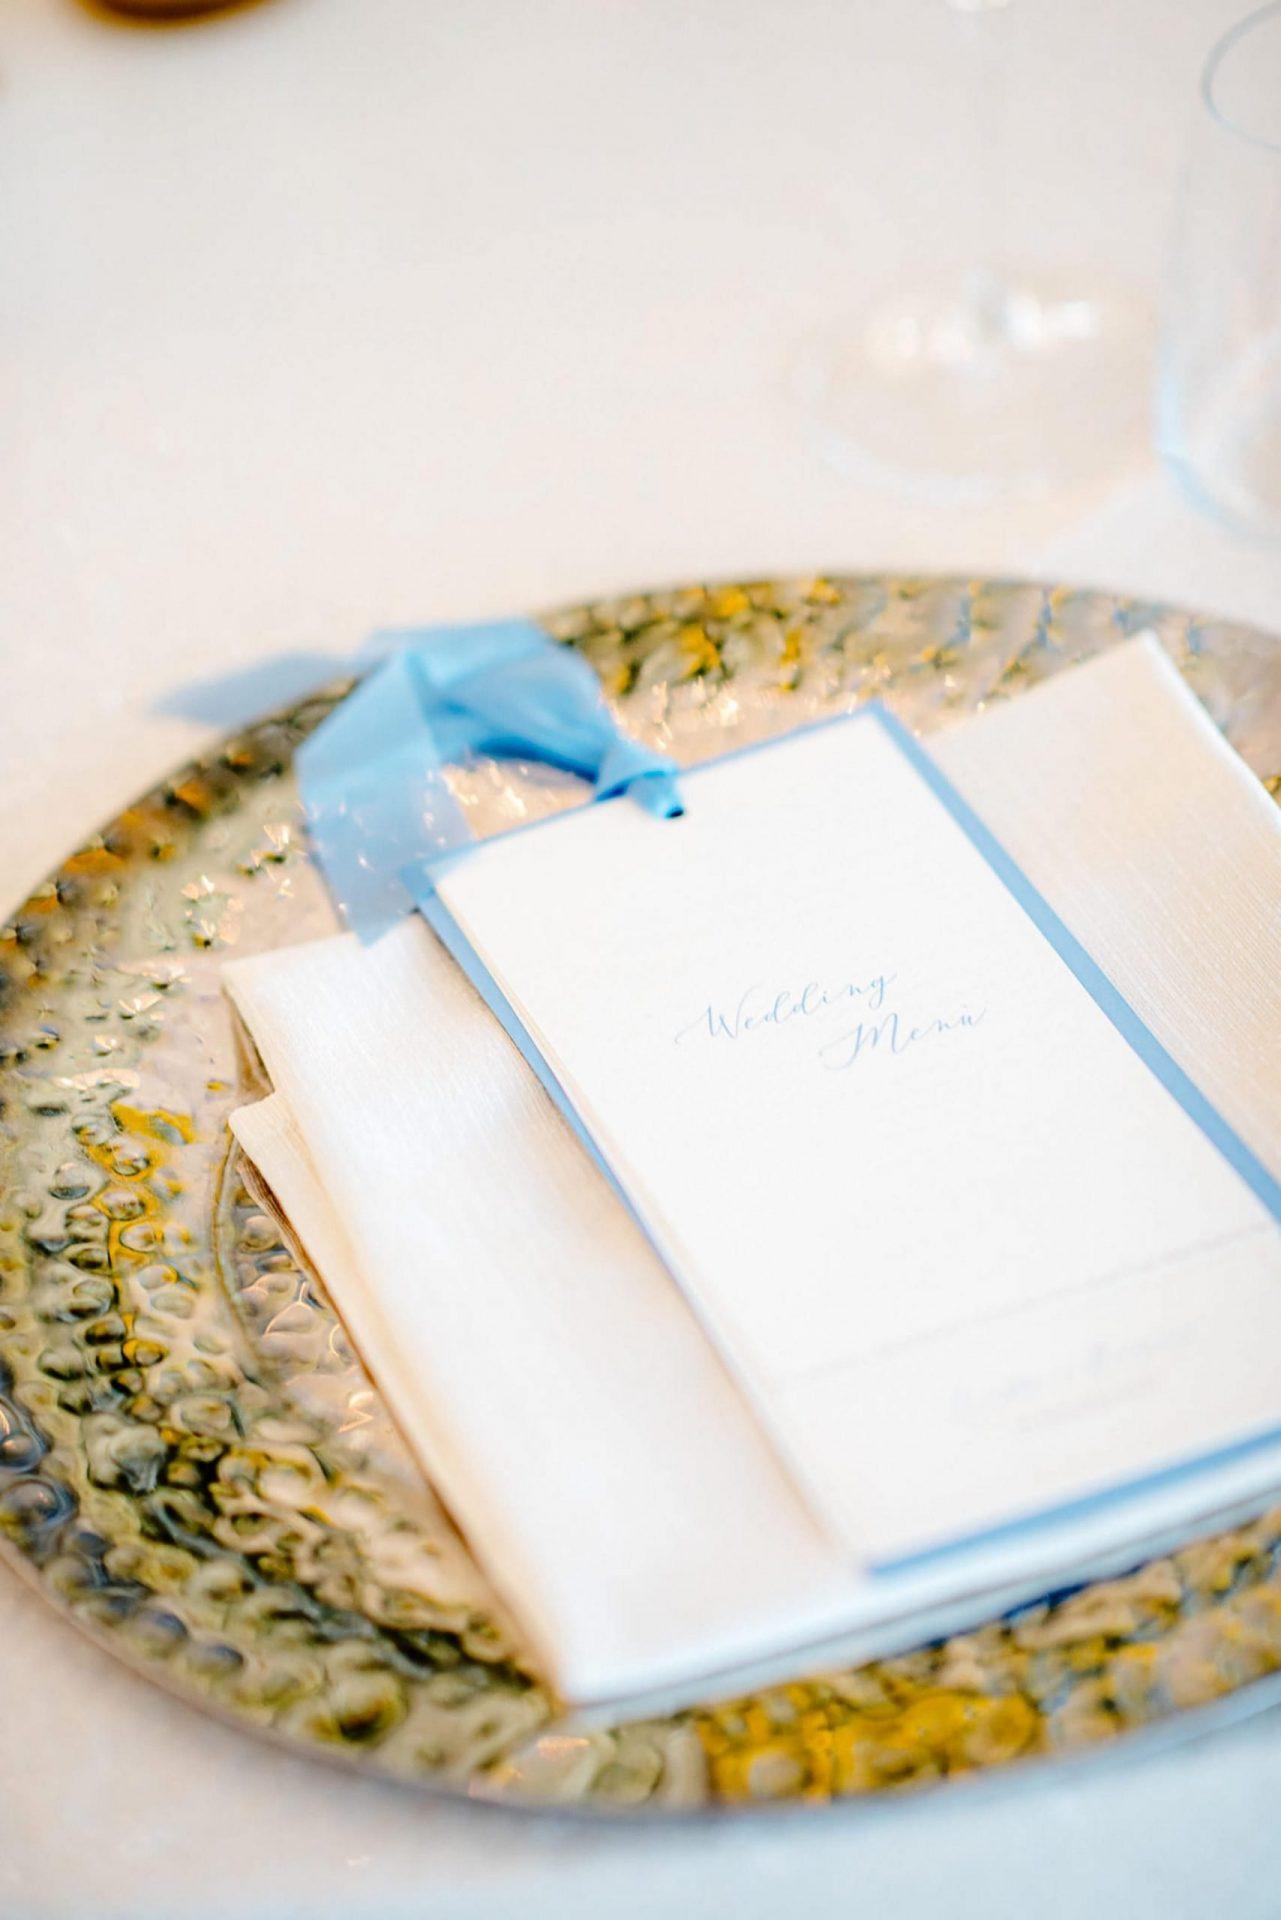 Linda and Enrico, wedding menu